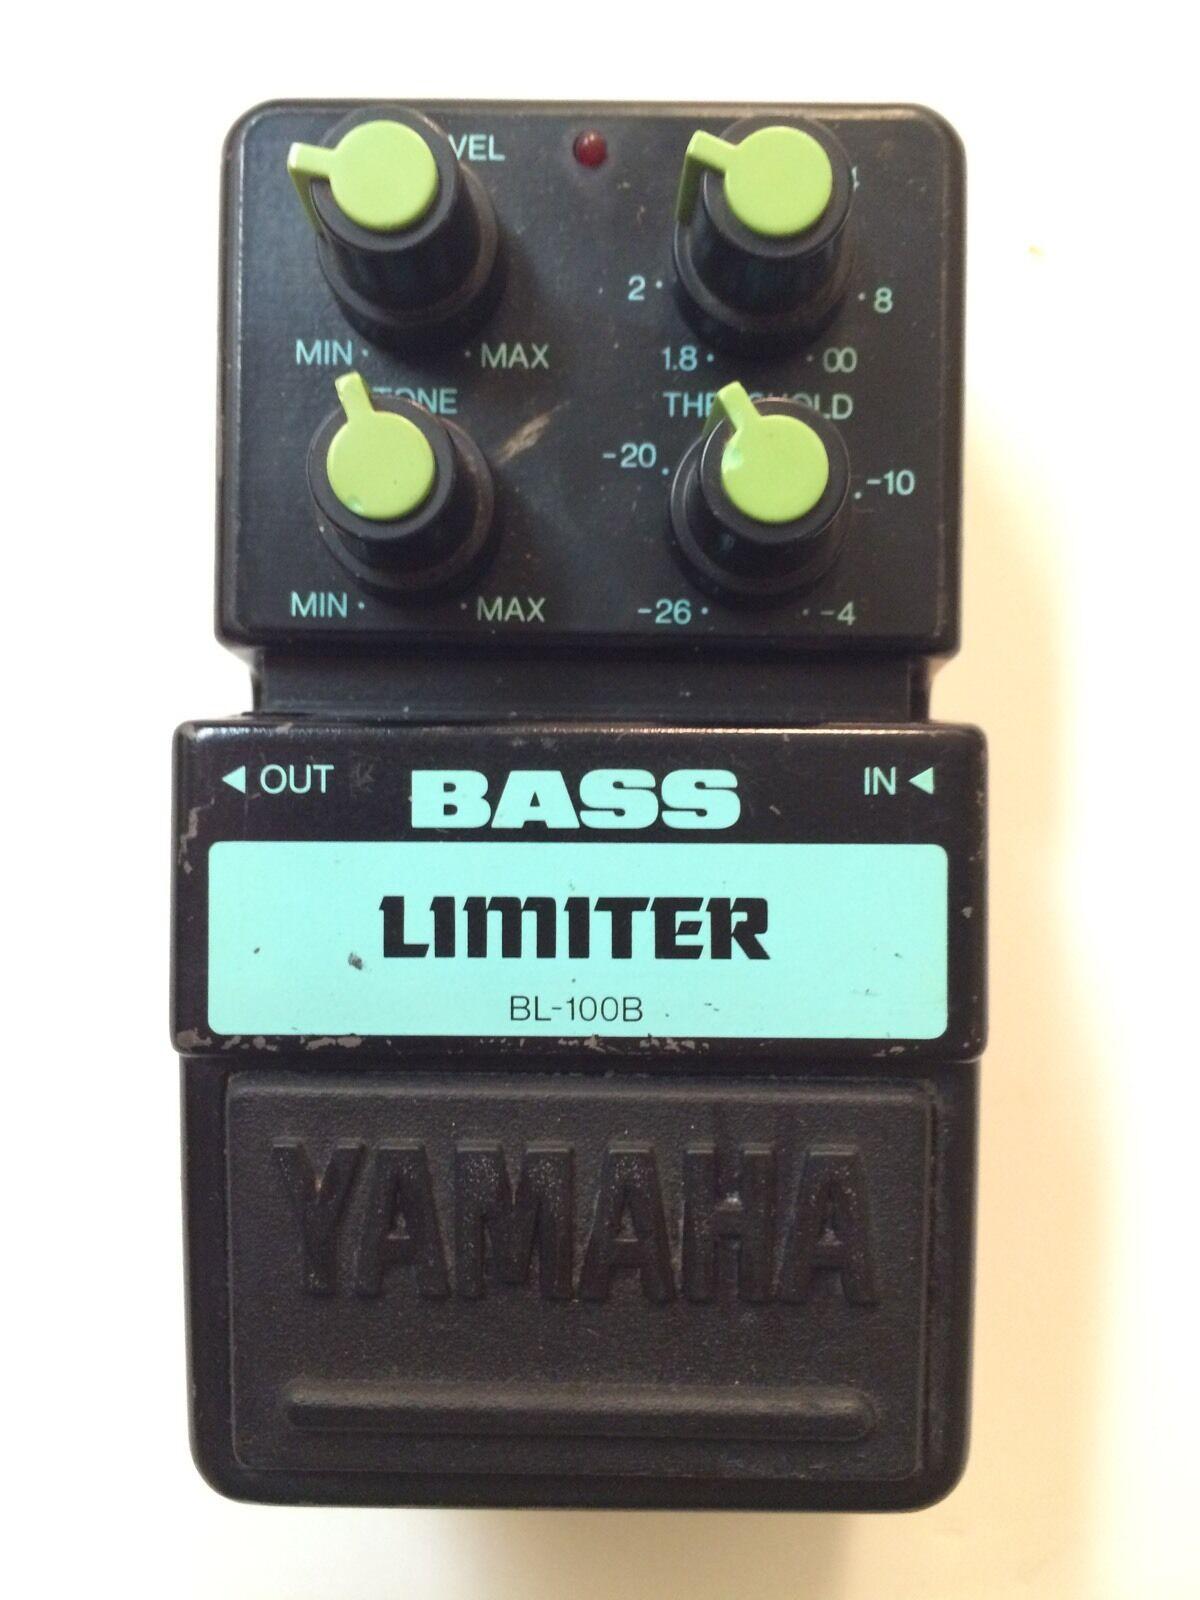 Yamaha BL-100B Bass Limiter Compressor Rare Vintage Guitar Pedal MIJ Japan